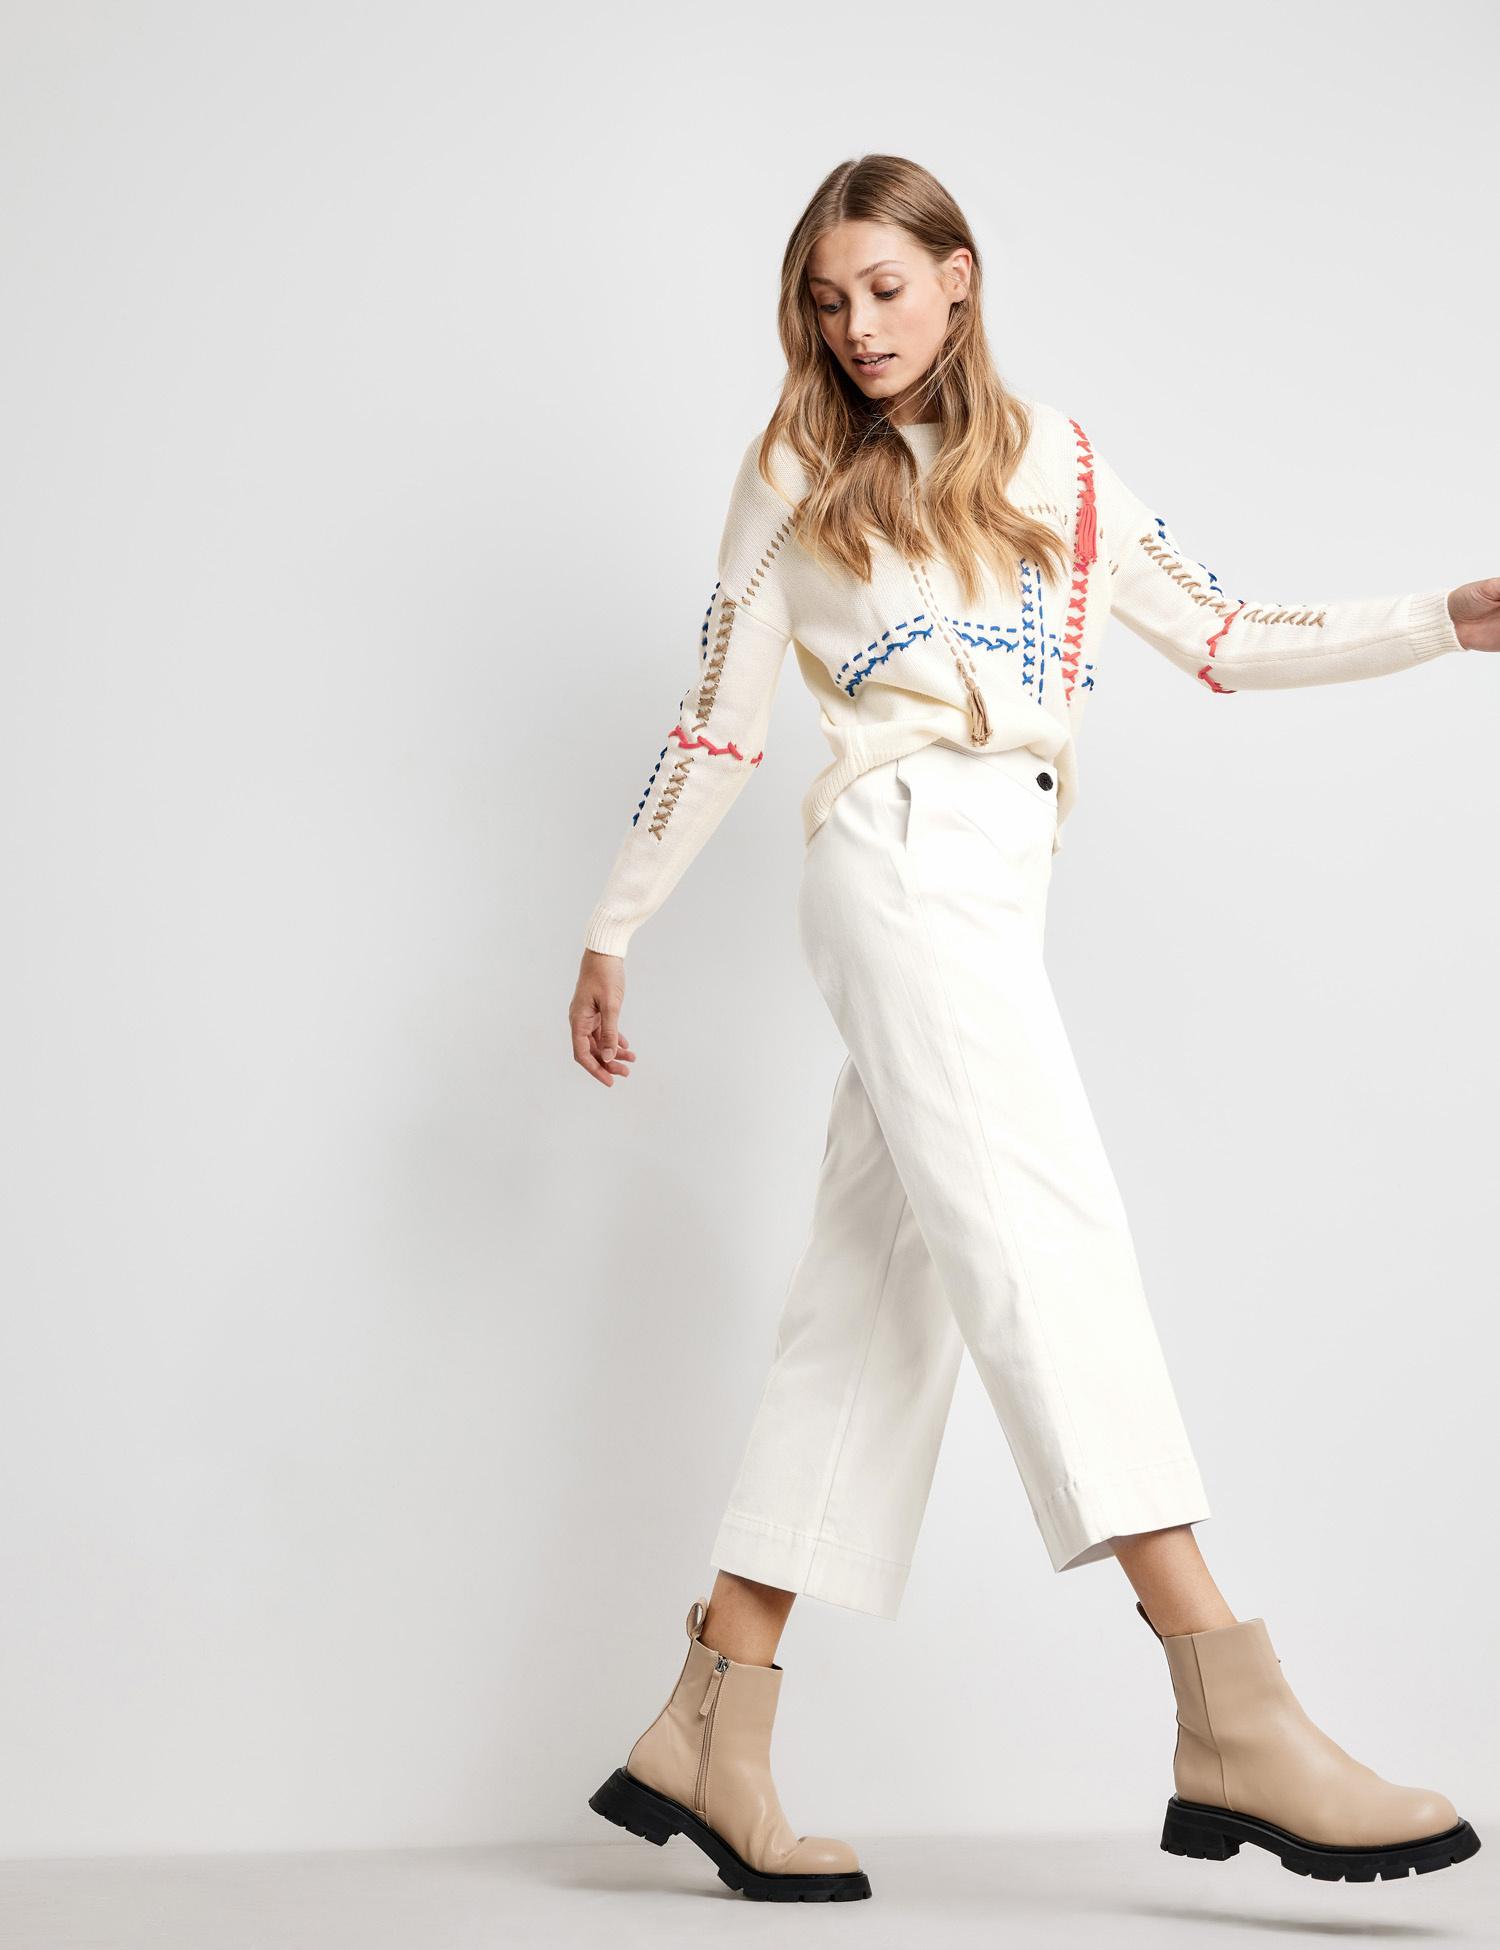 Taifun winter White 7/8 length trousers